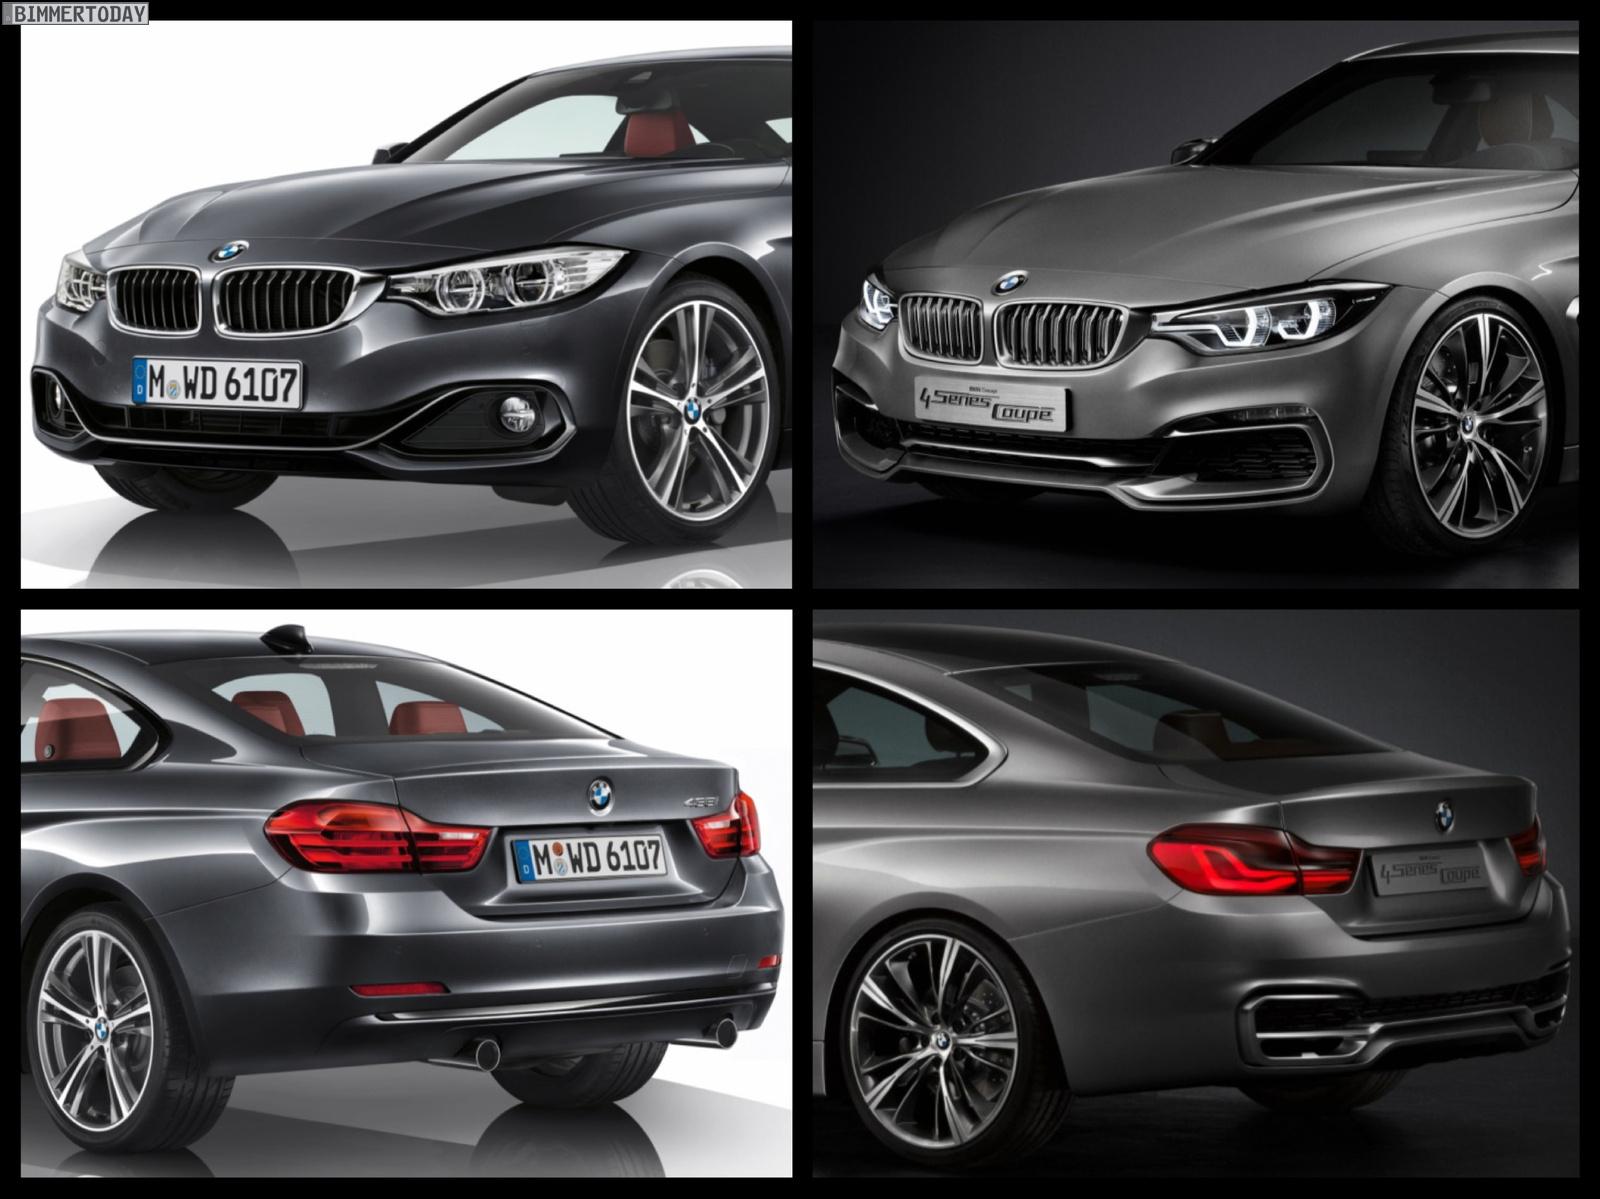 Bild-Vergleich Studie vs. Serie: BMW 4er Coupé F32 trifft ...